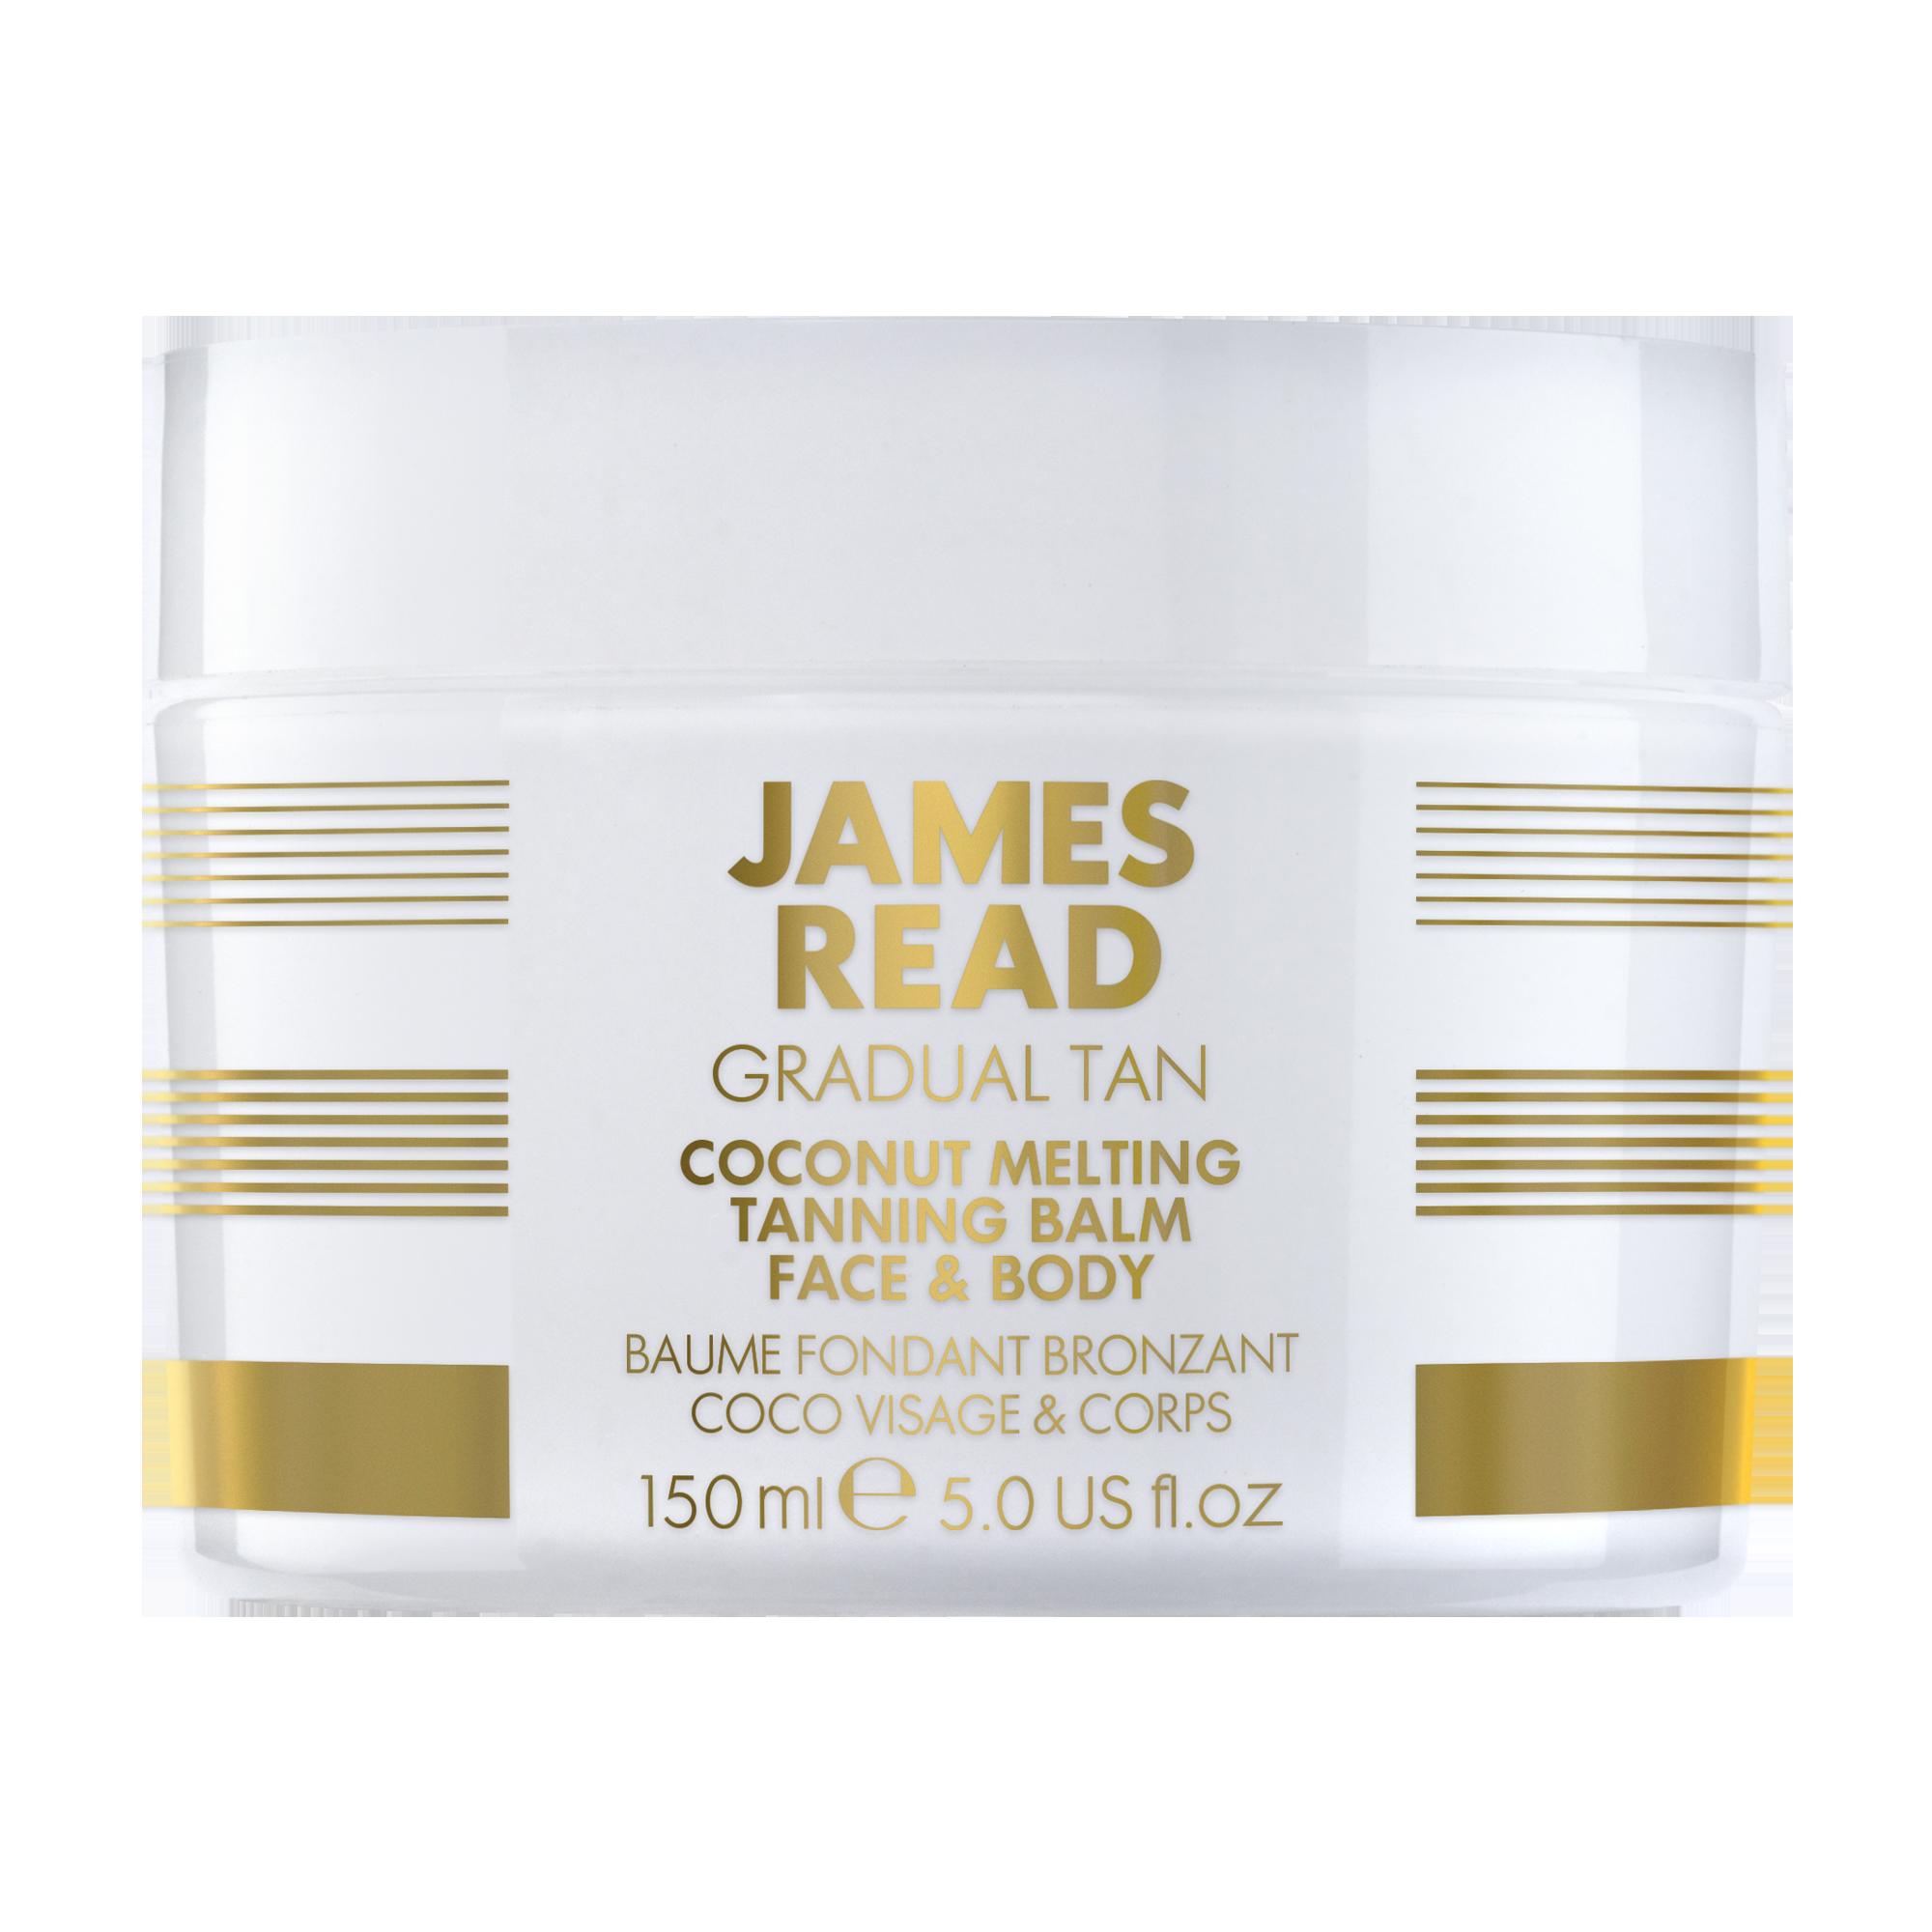 Coconut Melting Tanning Balm